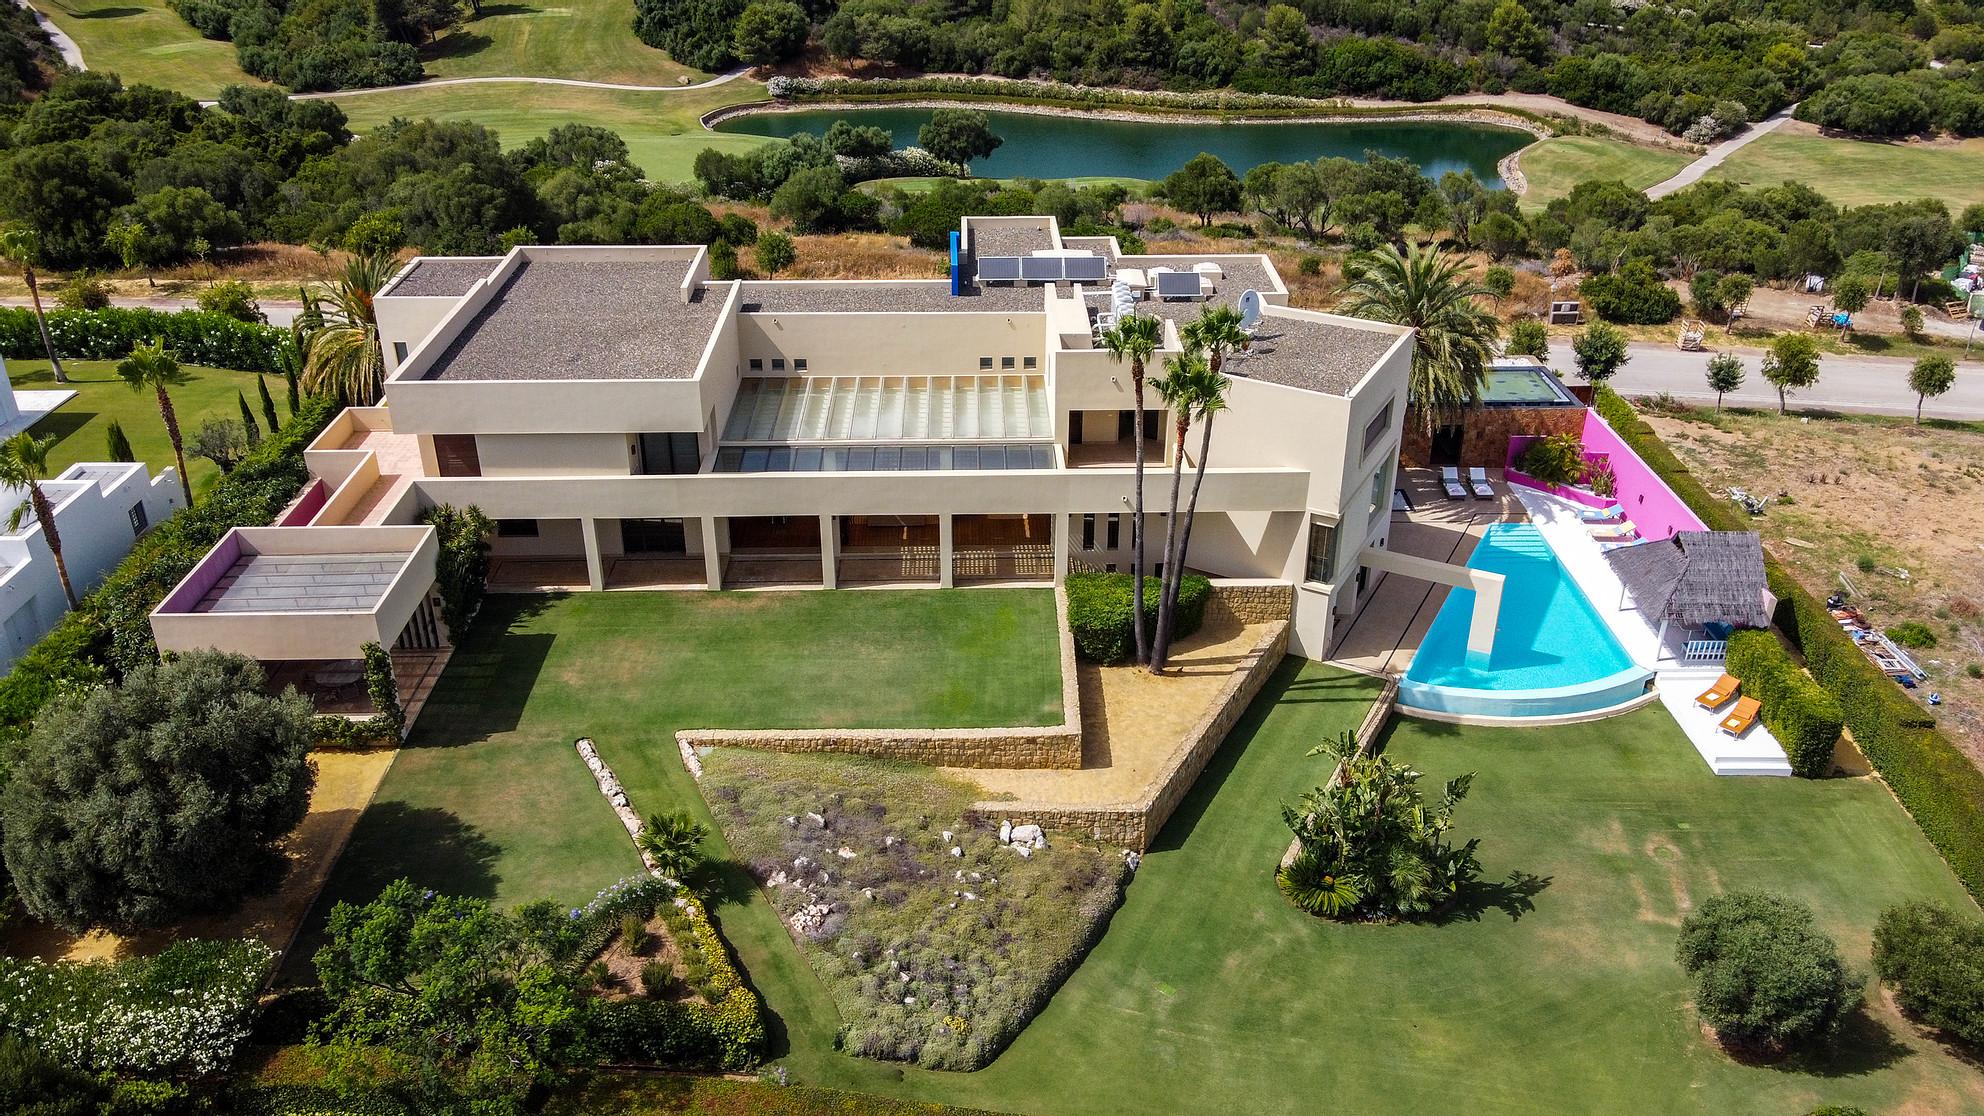 Moderne Villa, la Reserva de Sotogrande 5.750.000 €